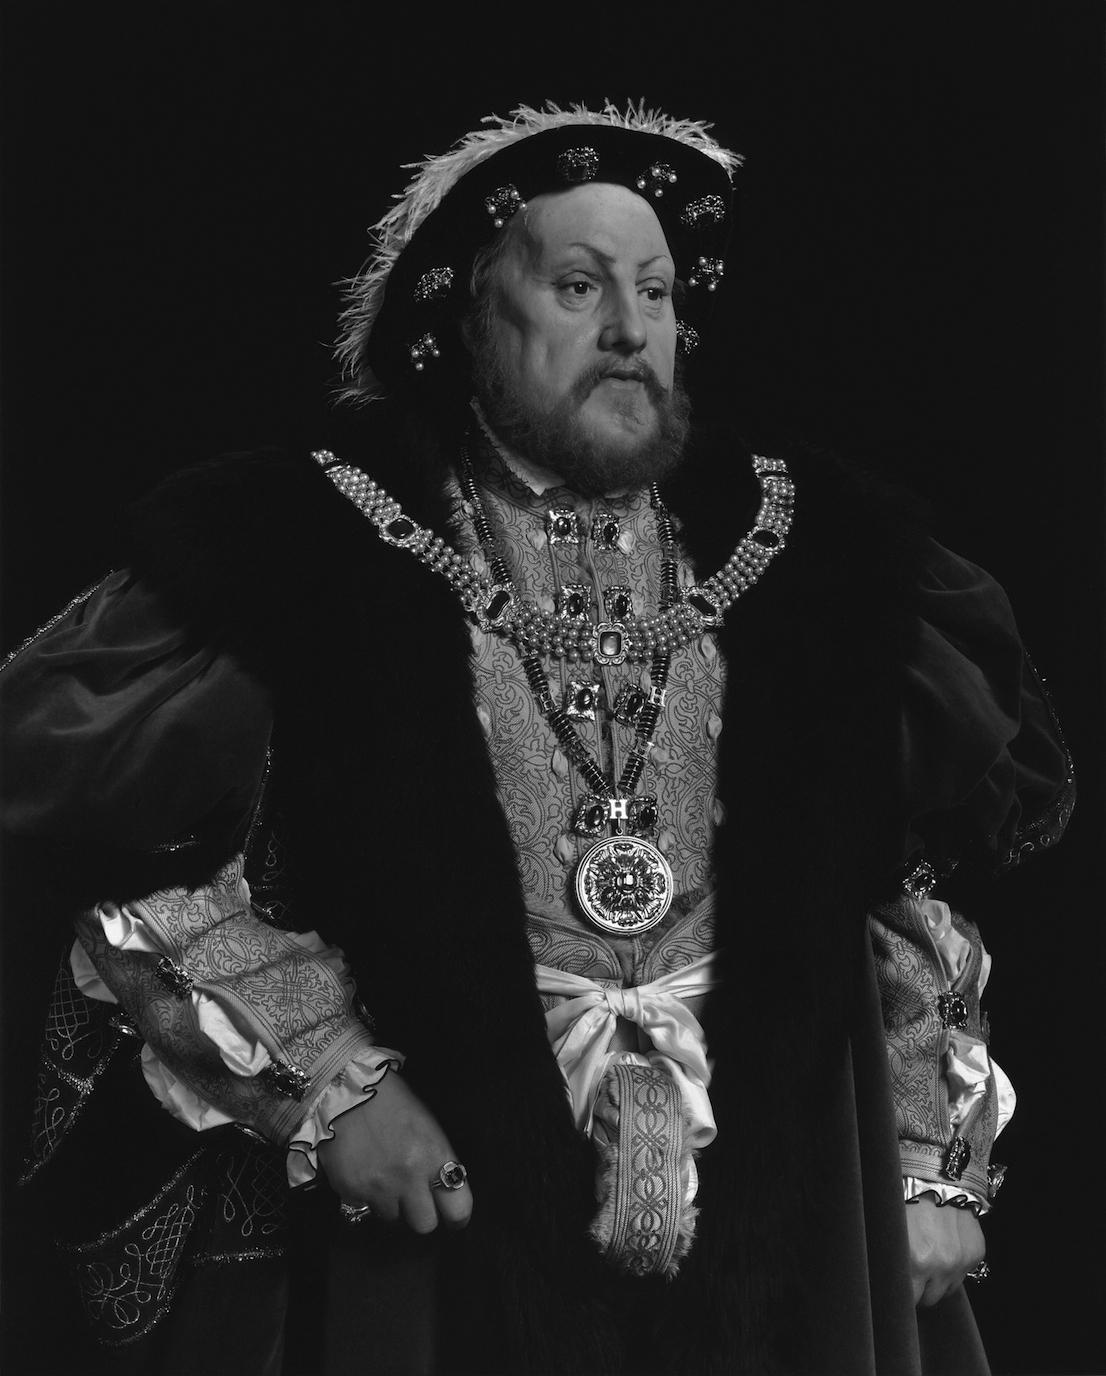 Hiroshi Sugimoto, Henry VIII, 1999